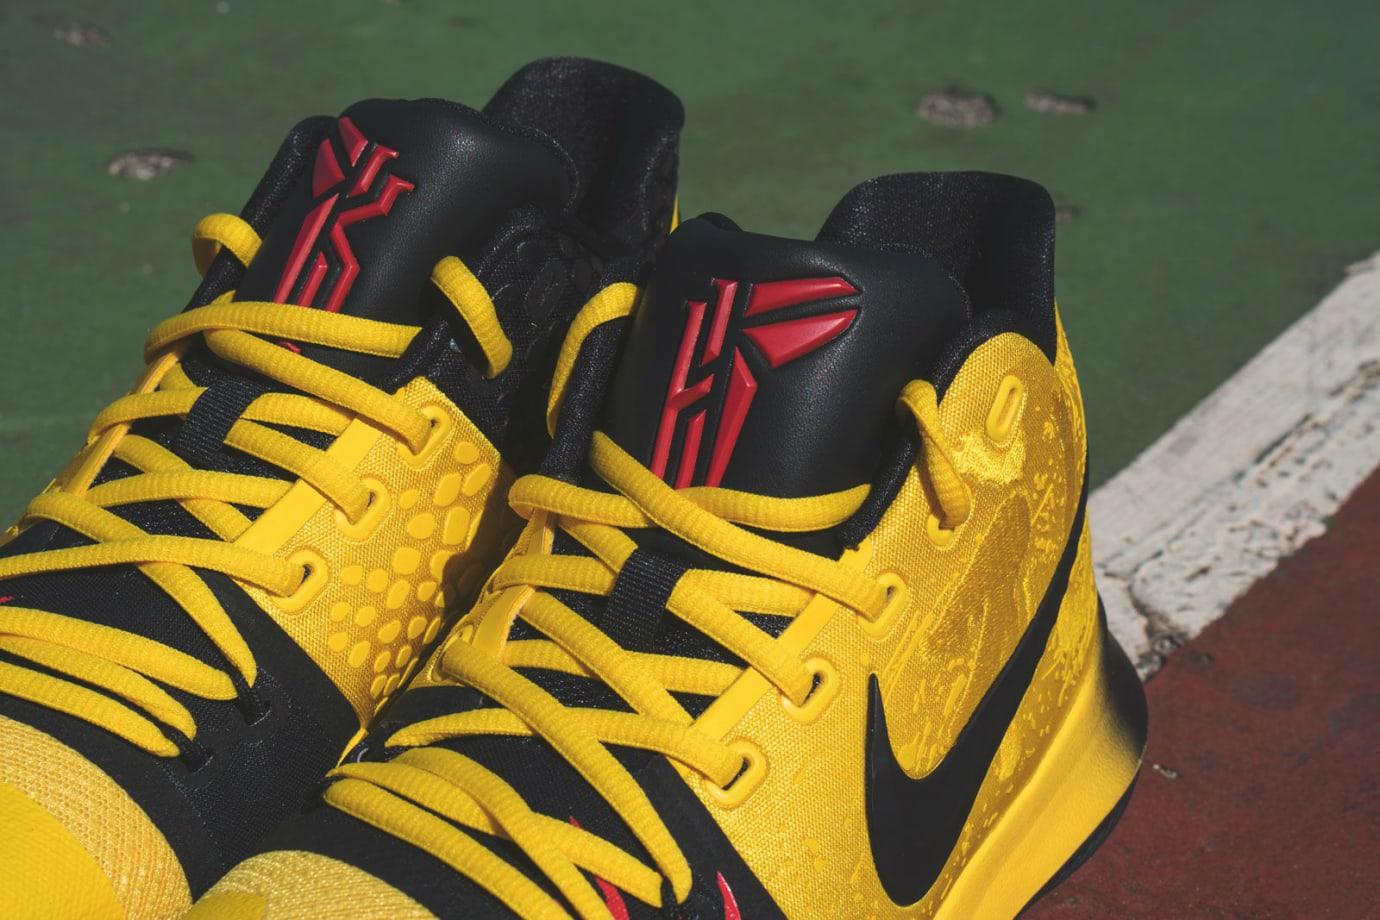 a2bb1a1d146941 Nike Kyrie 3 Mamba Mentality Bruce Lee Restock Tongue AJ1672-700